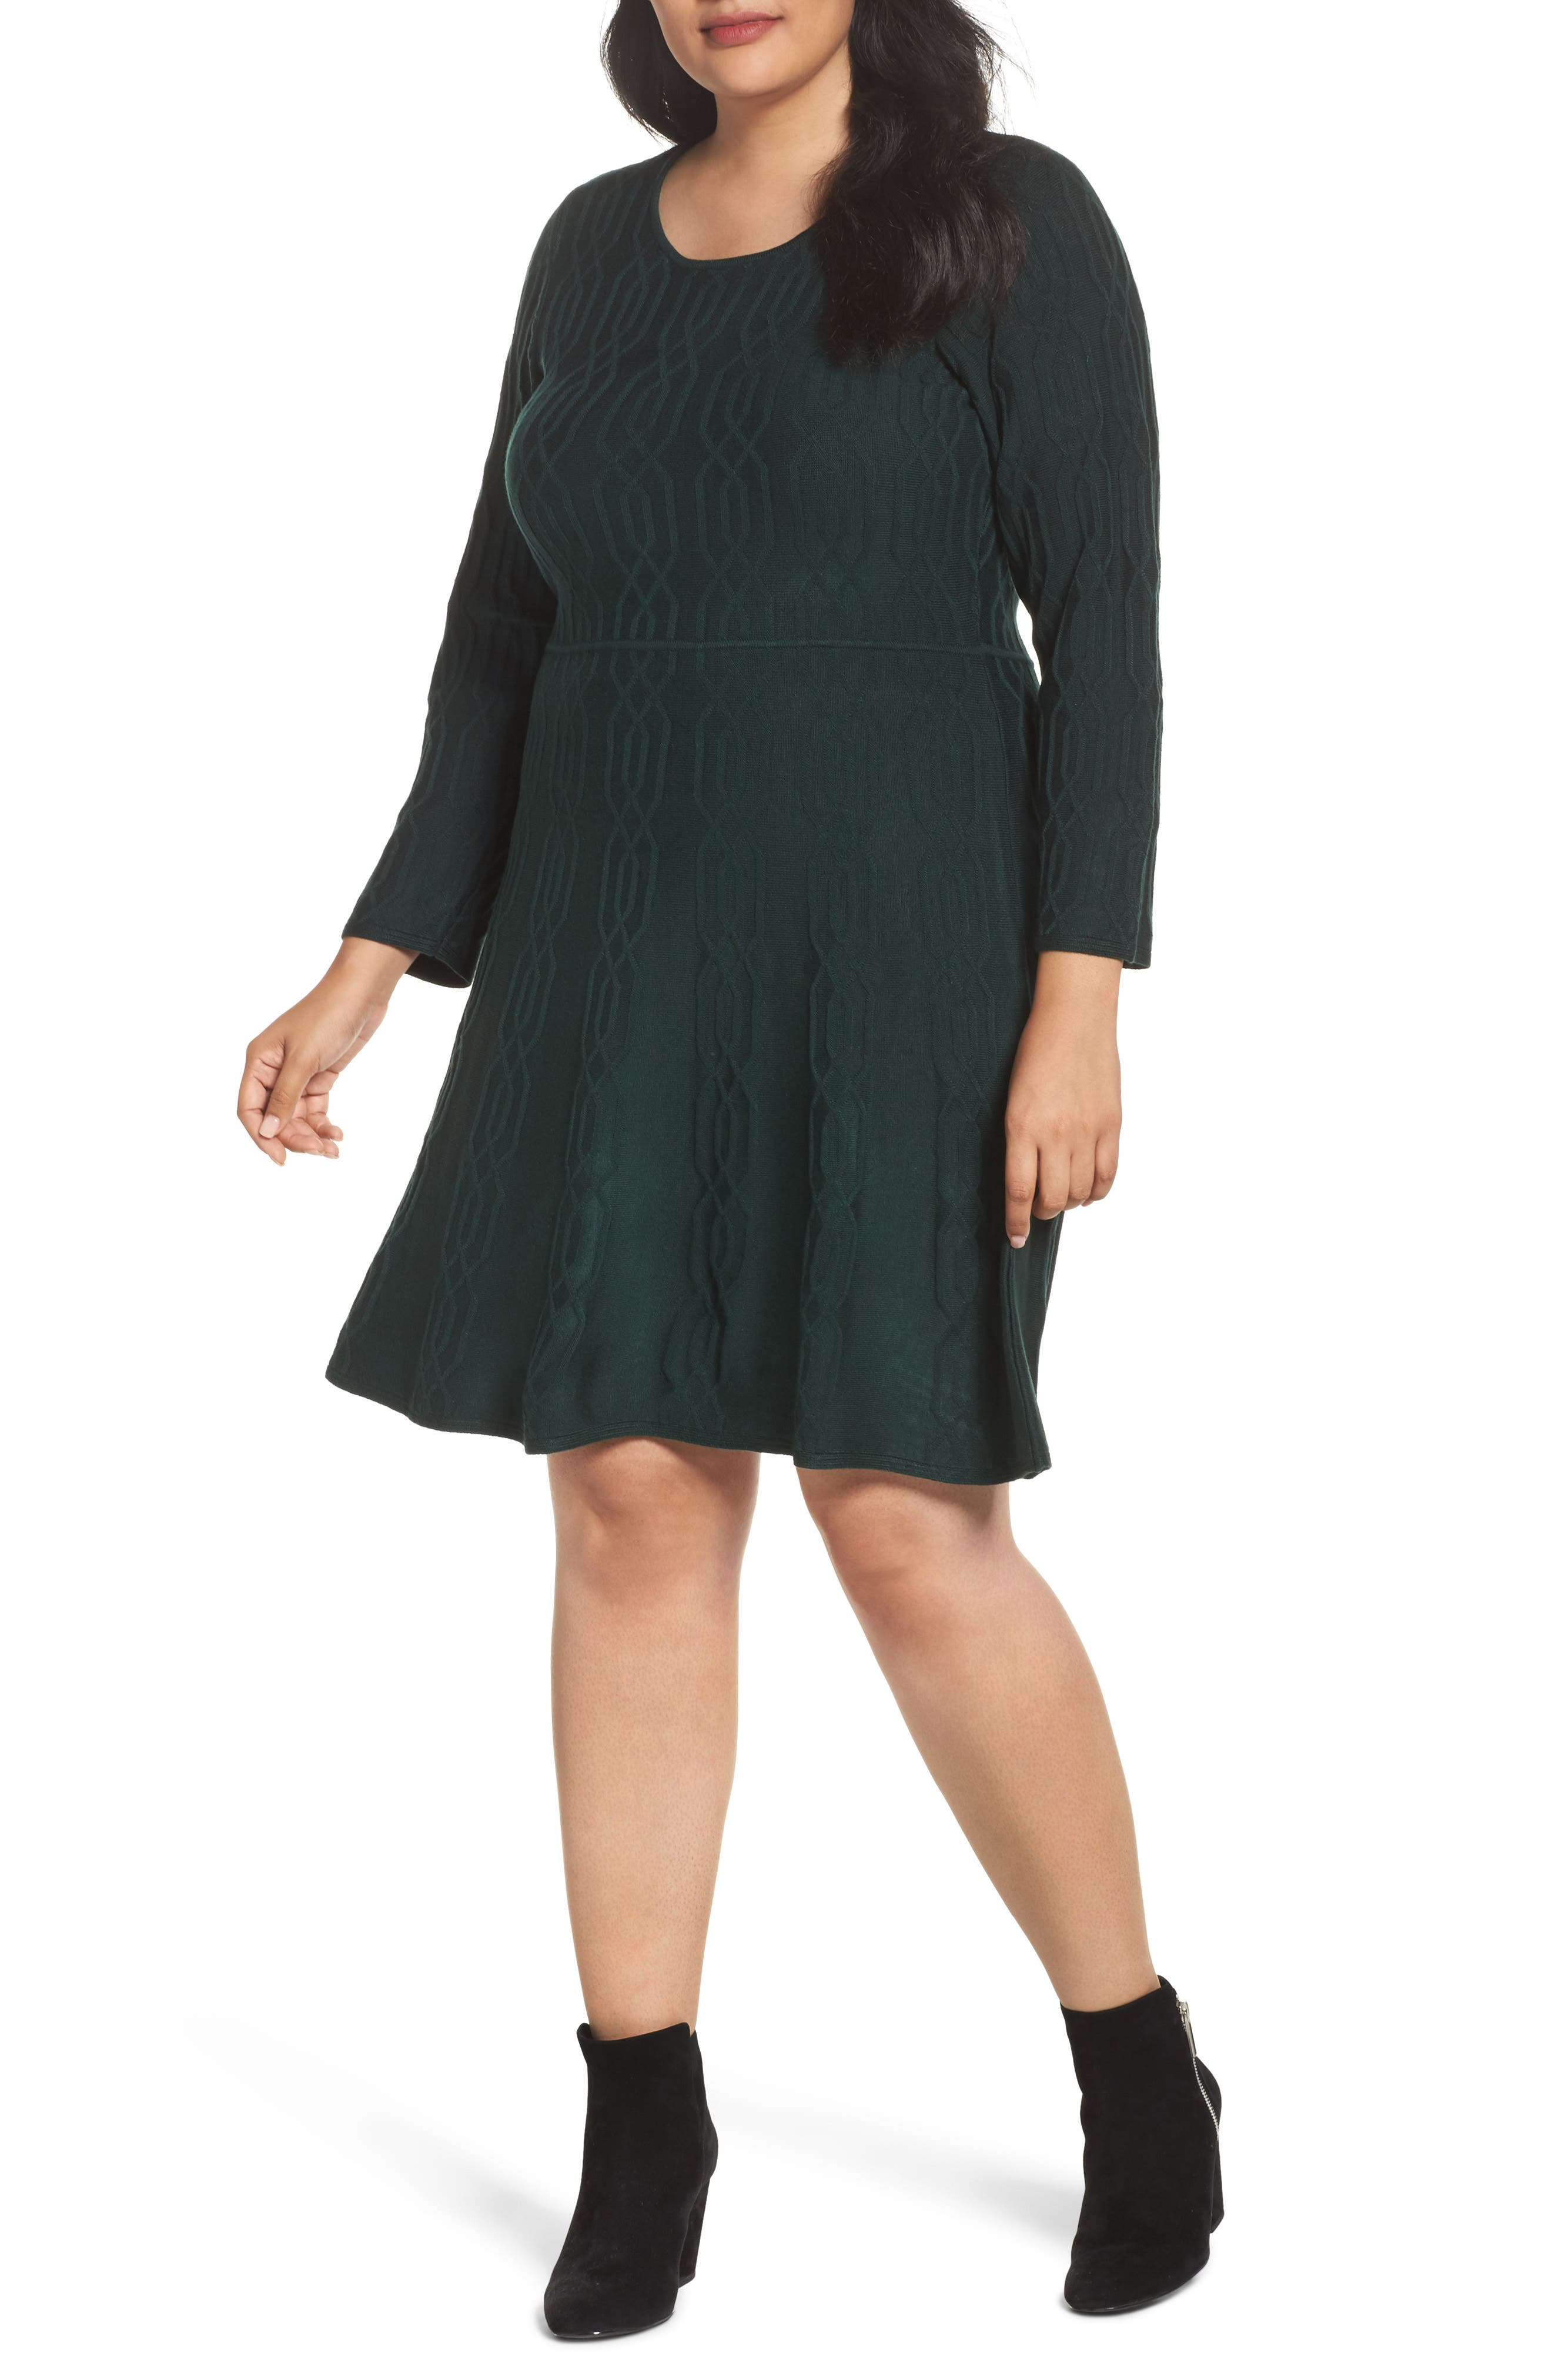 Jacquard Knit Fit & Flare Dress,                             Main thumbnail 1, color,                             Green